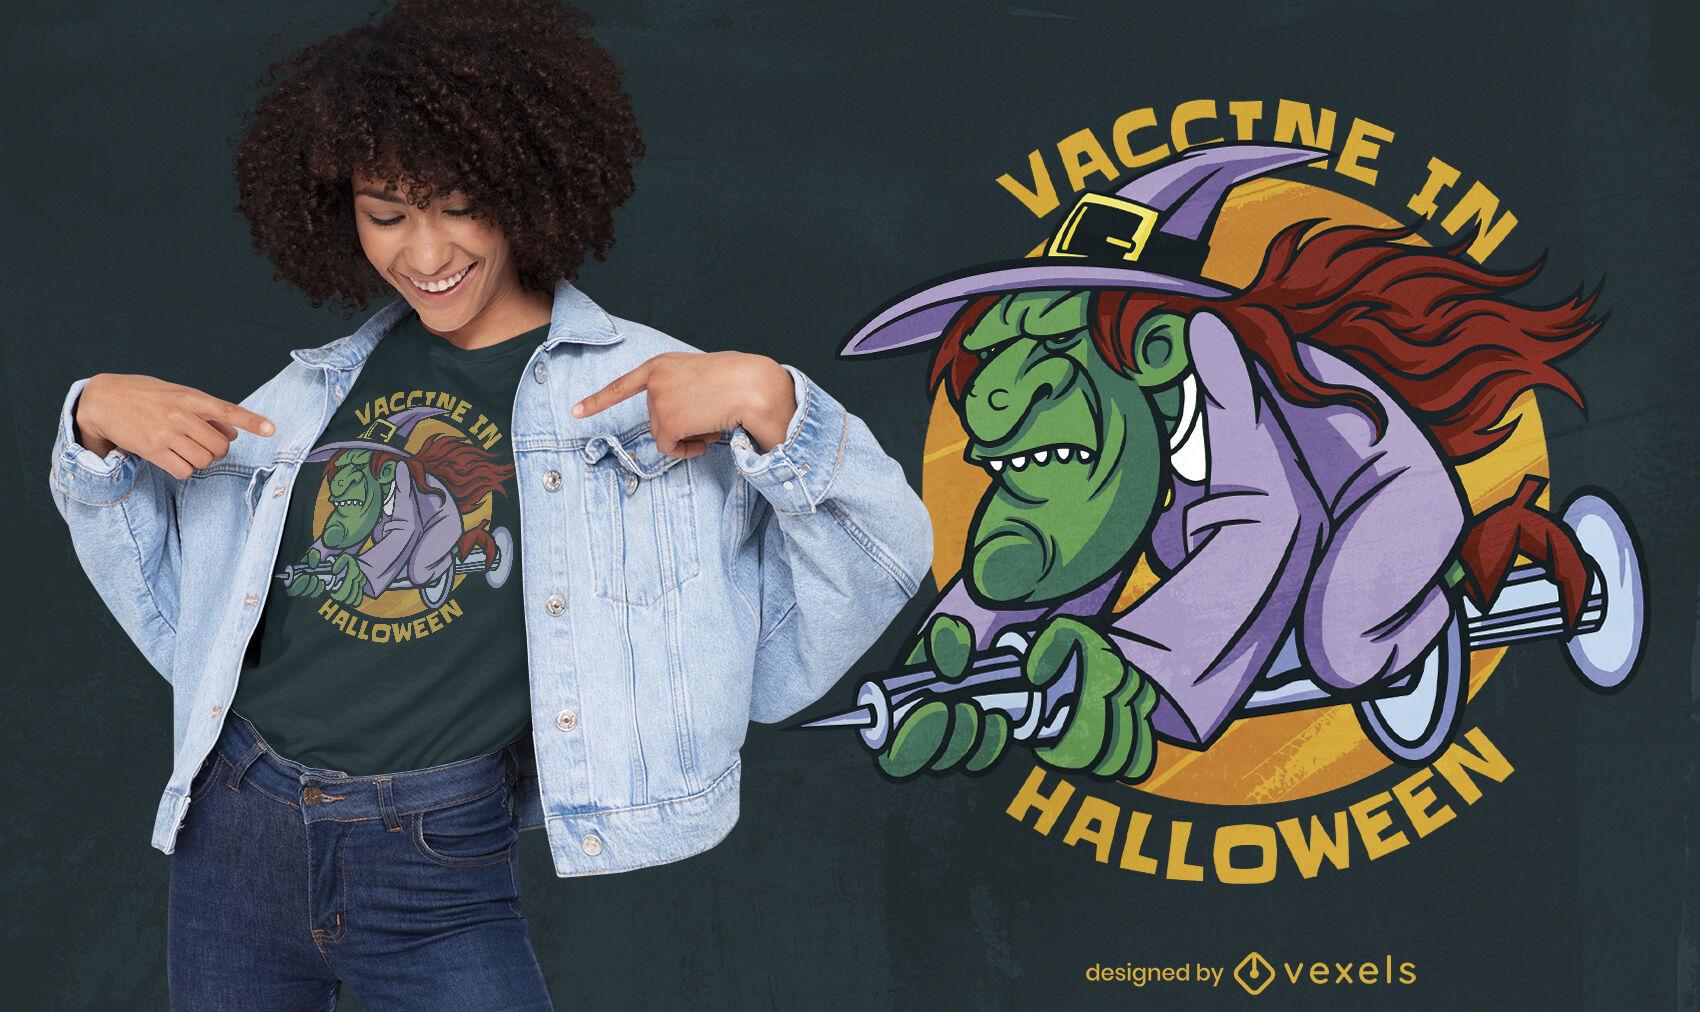 Vacuna genial en dise?o de camiseta de halloween